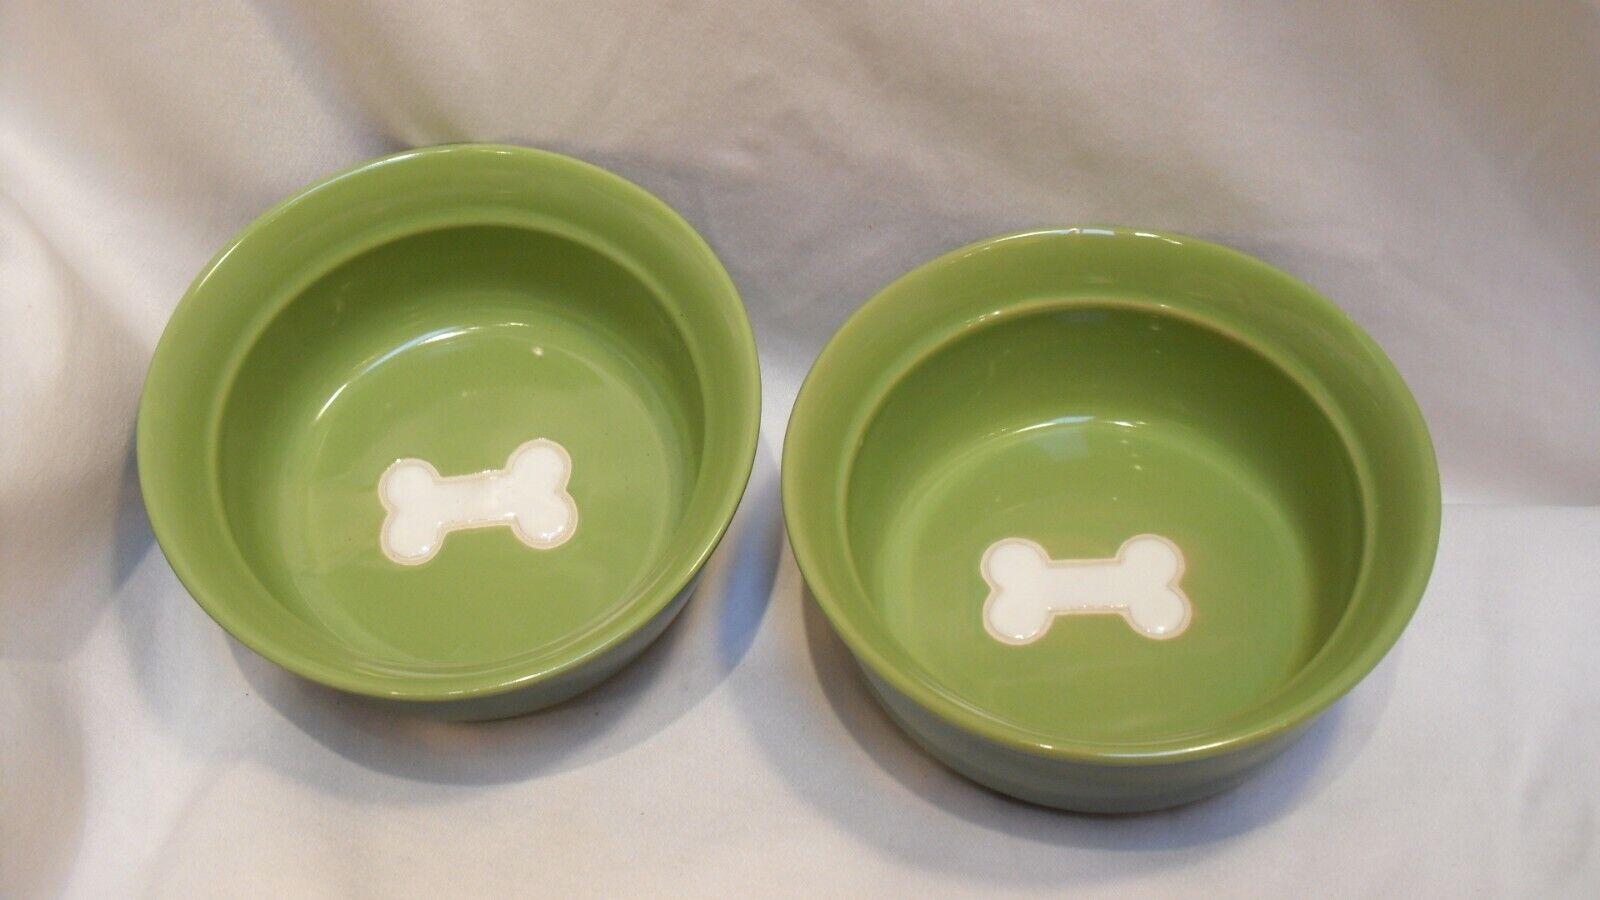 2 Tienshan Ceramic Dog Food Bowls Green with White Bone Design 6